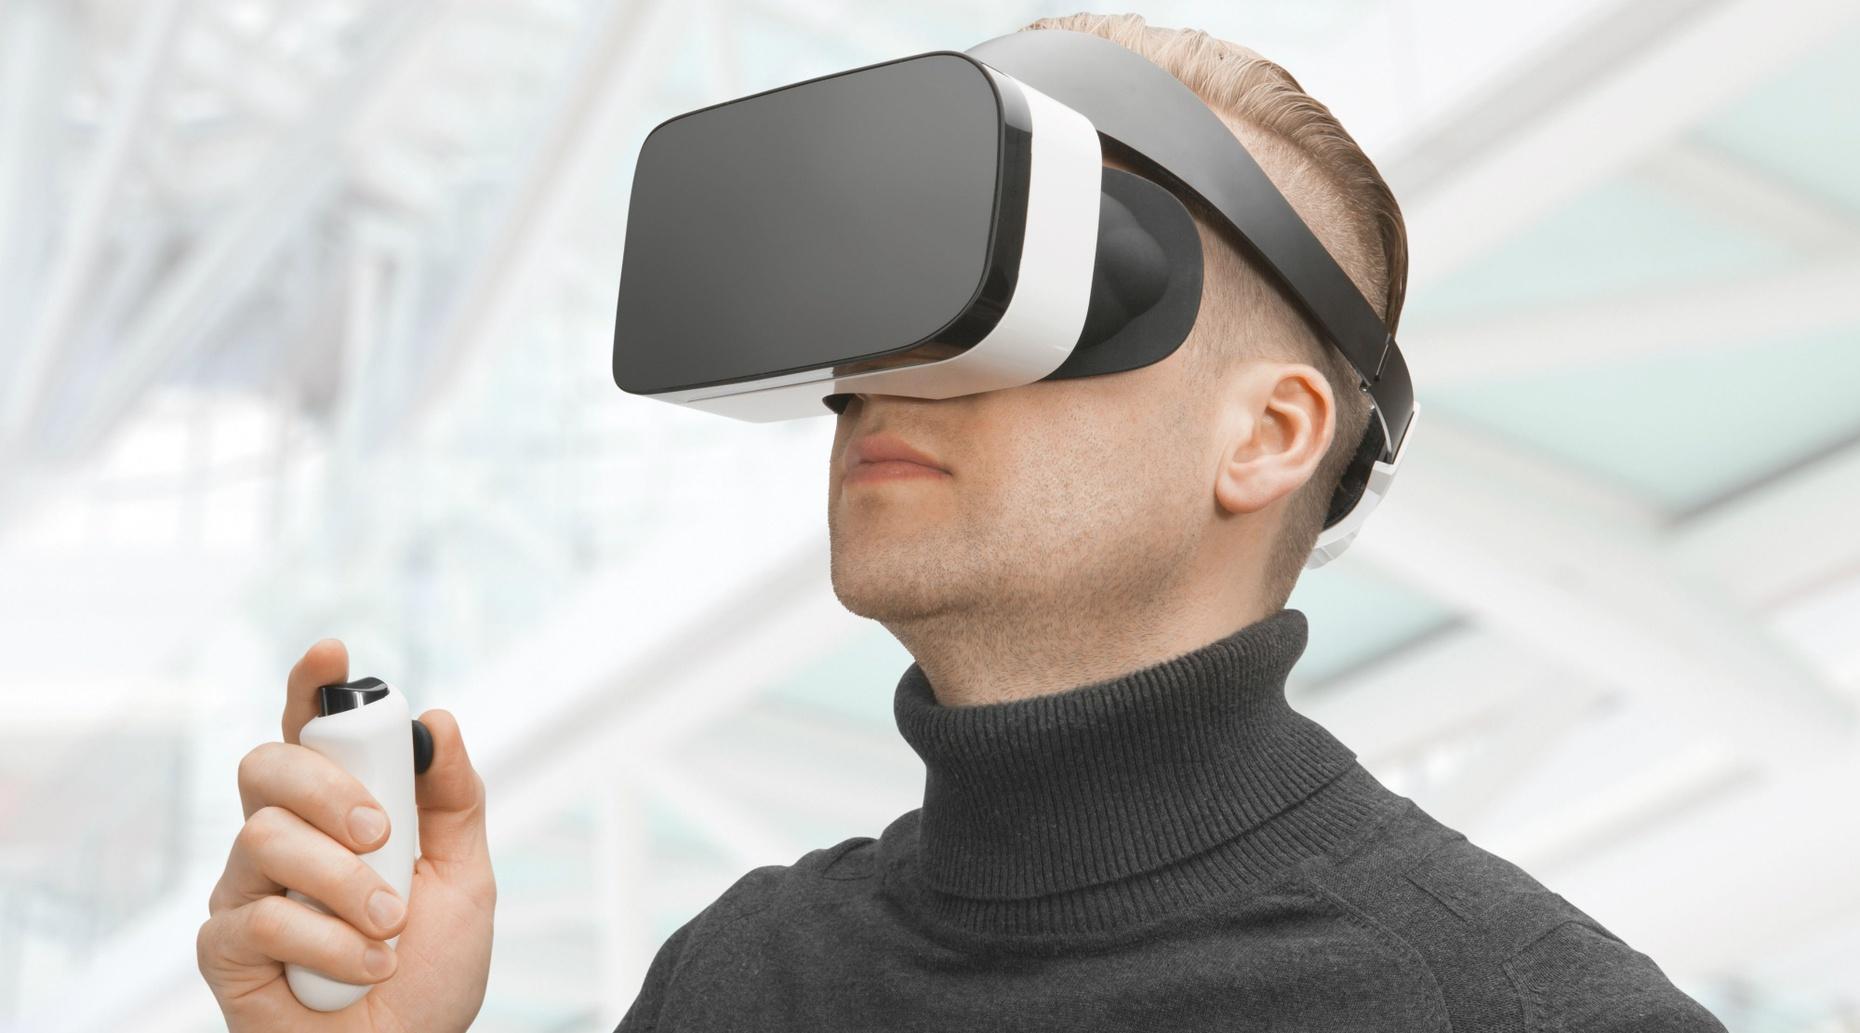 1-Hour Virtual Reality Fitness Game